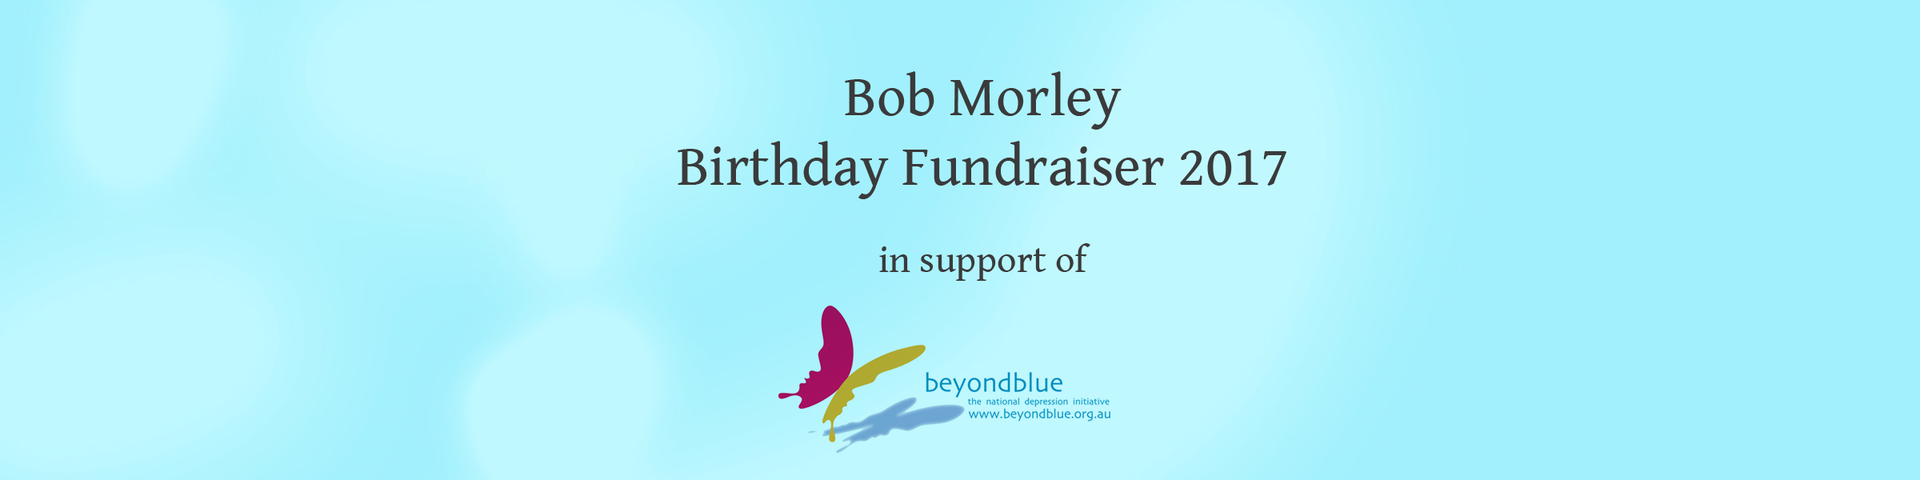 Bob Morley Birthday Fundraiser Store